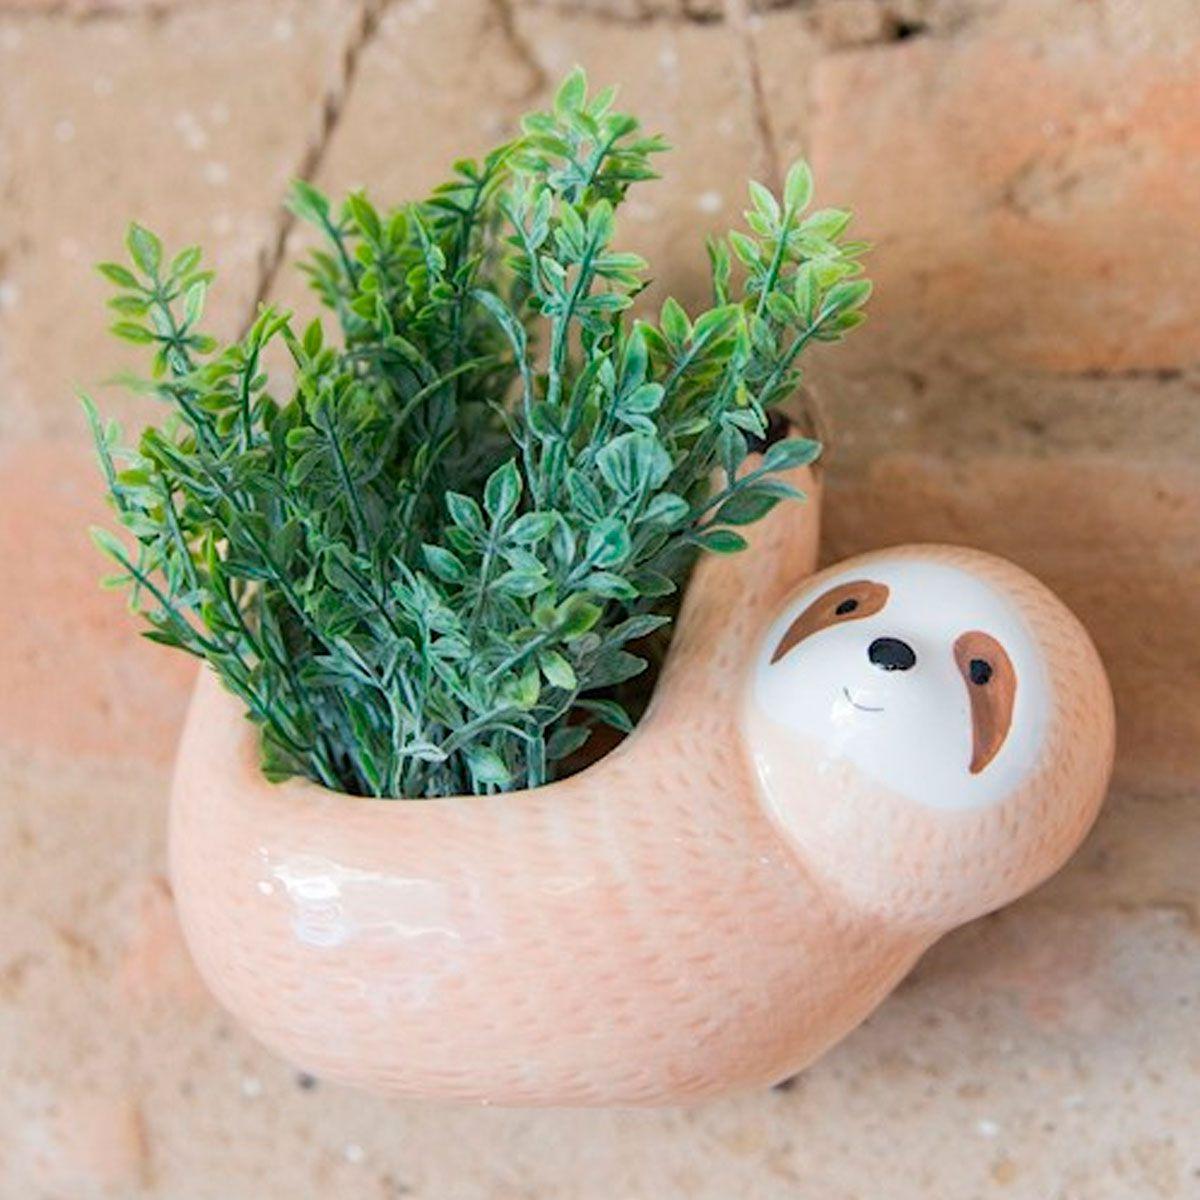 Cachepot Pendente Vaso Decorativo Bicho Preguiça